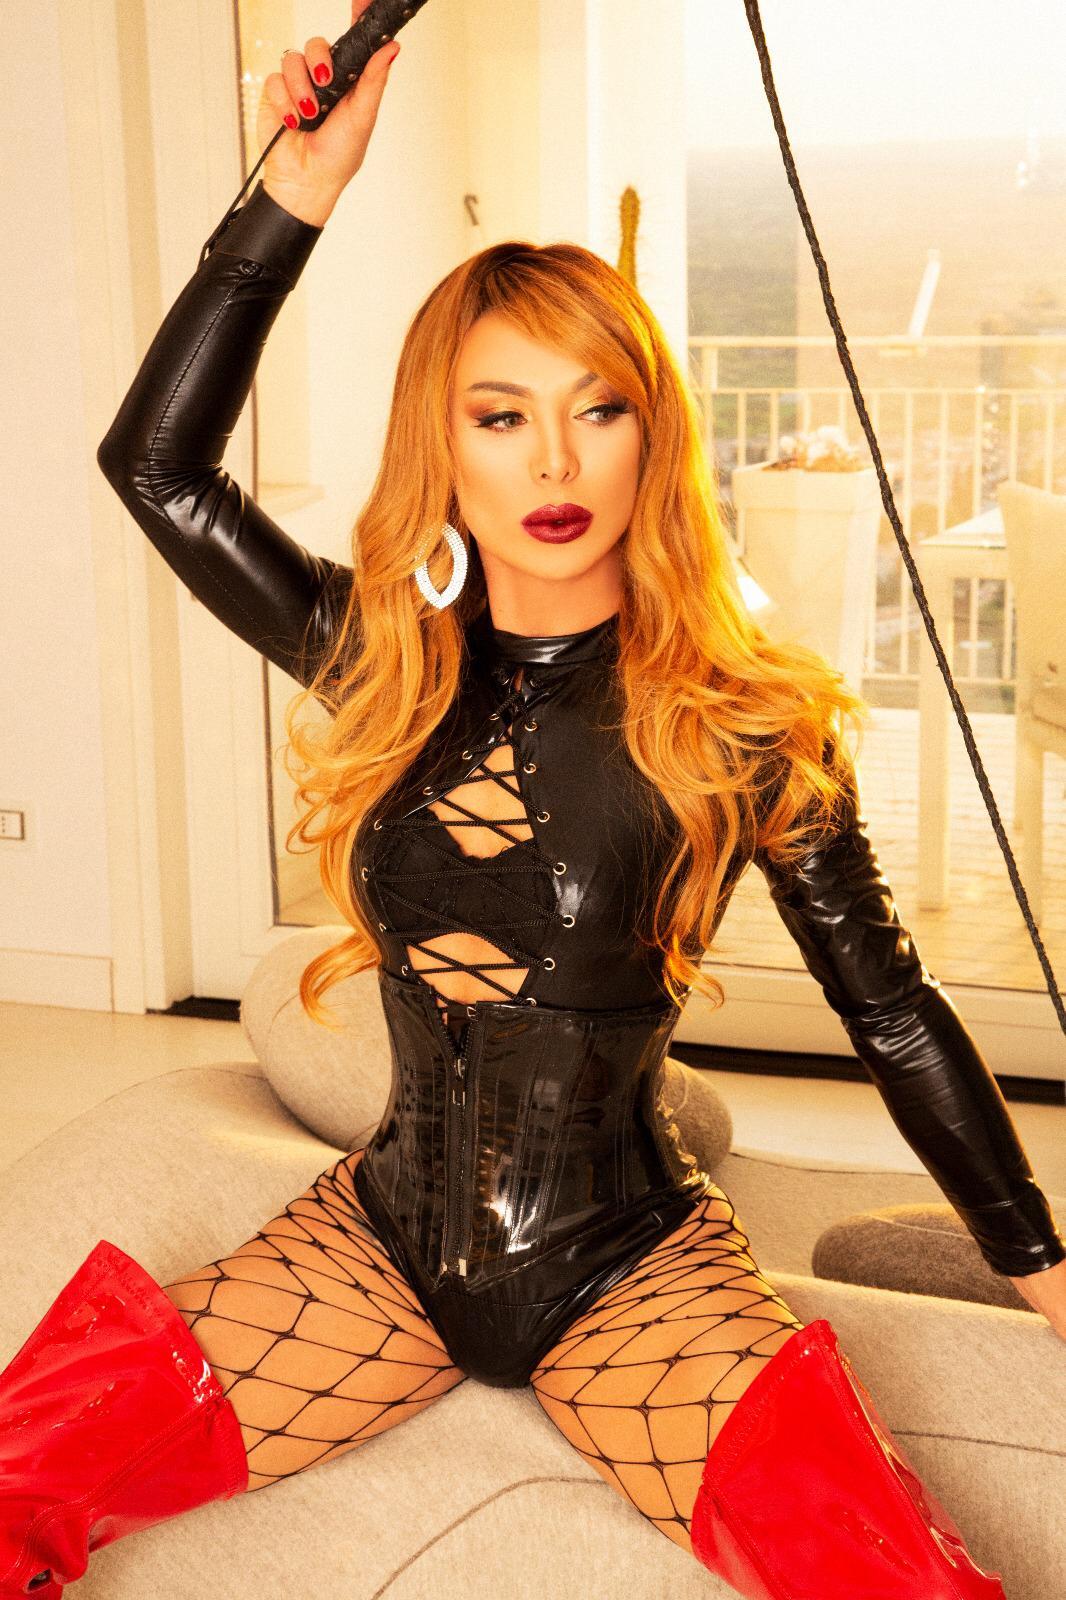 Tasha escort trans mistress